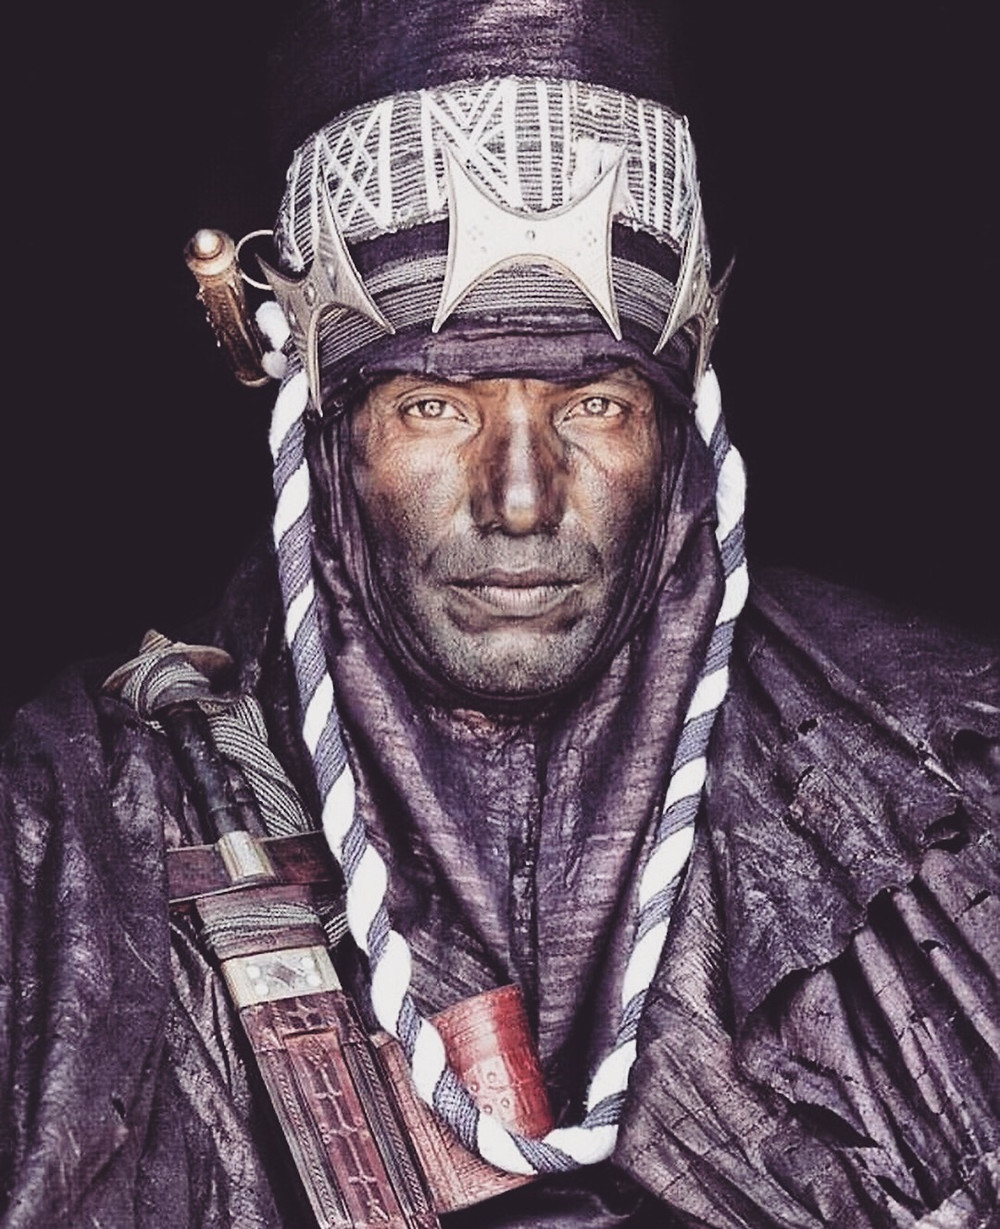 A festively dressed Tuareg man